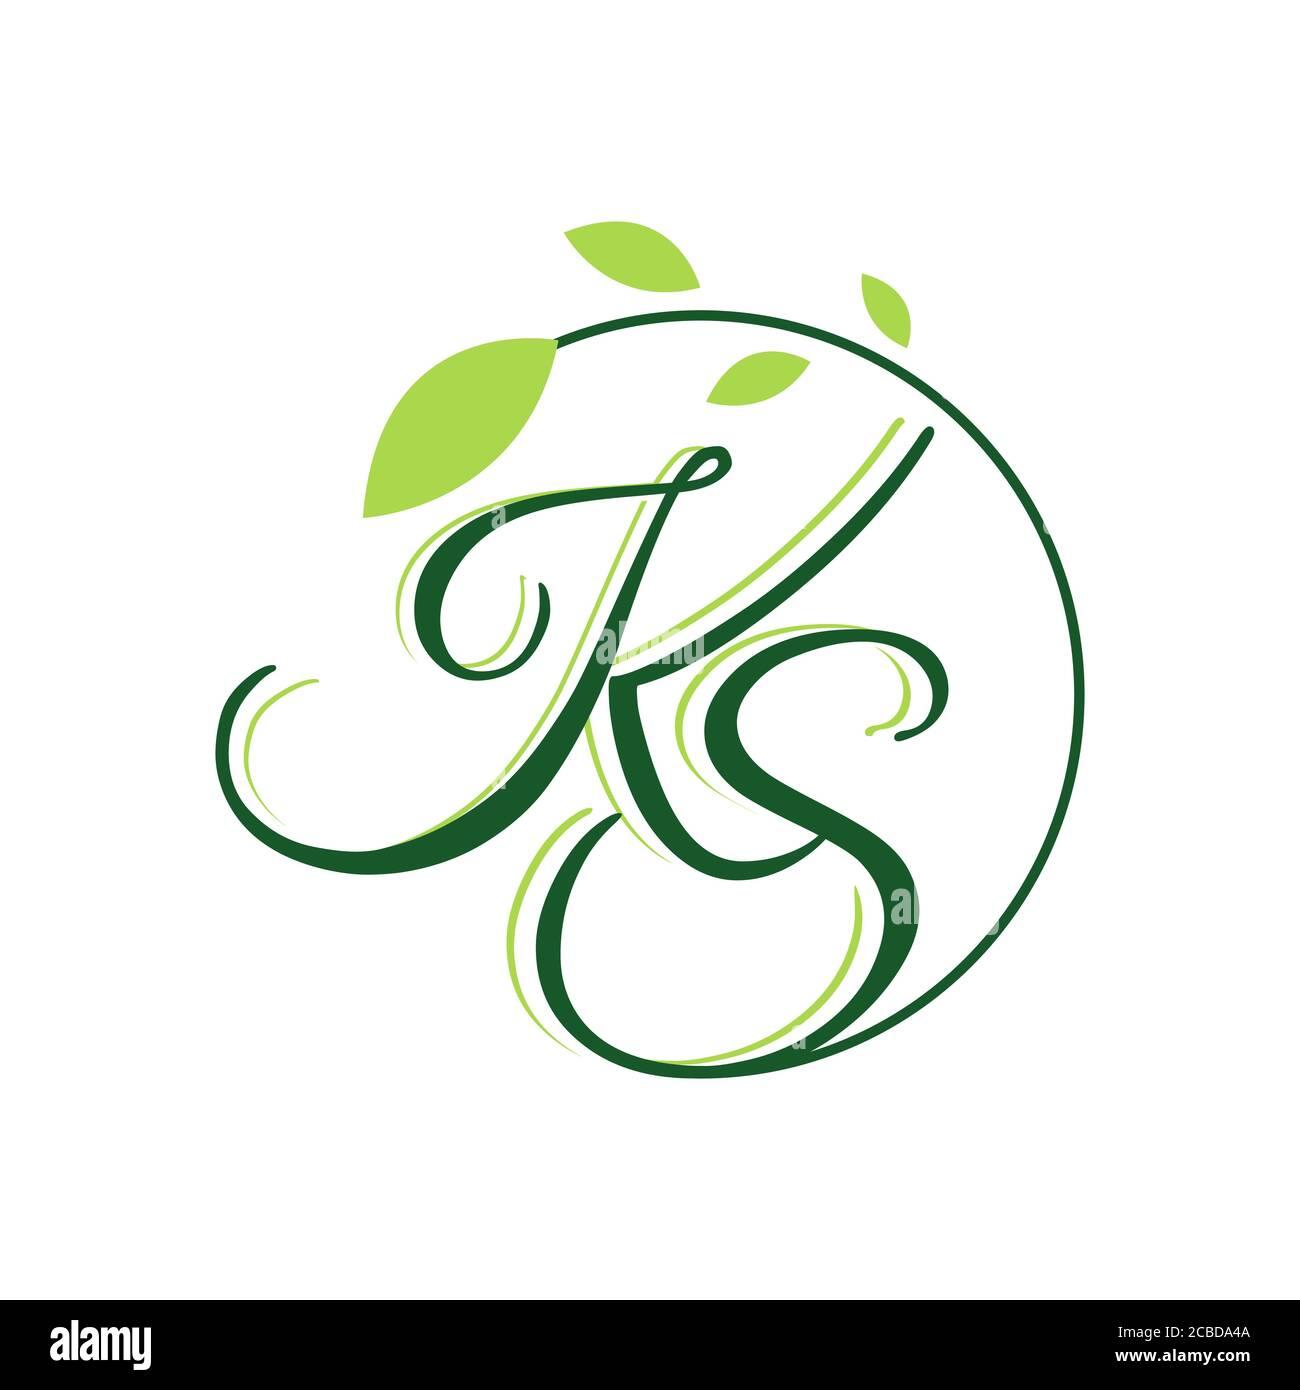 letter k s with leaf logo design vector green initial ks logo graphic concept letter k eco symbol ks icon stock vector image art alamy https www alamy com letter k s with leaf logo design vector green initial ks logo graphic concept letter k eco symbol ks icon image368472282 html